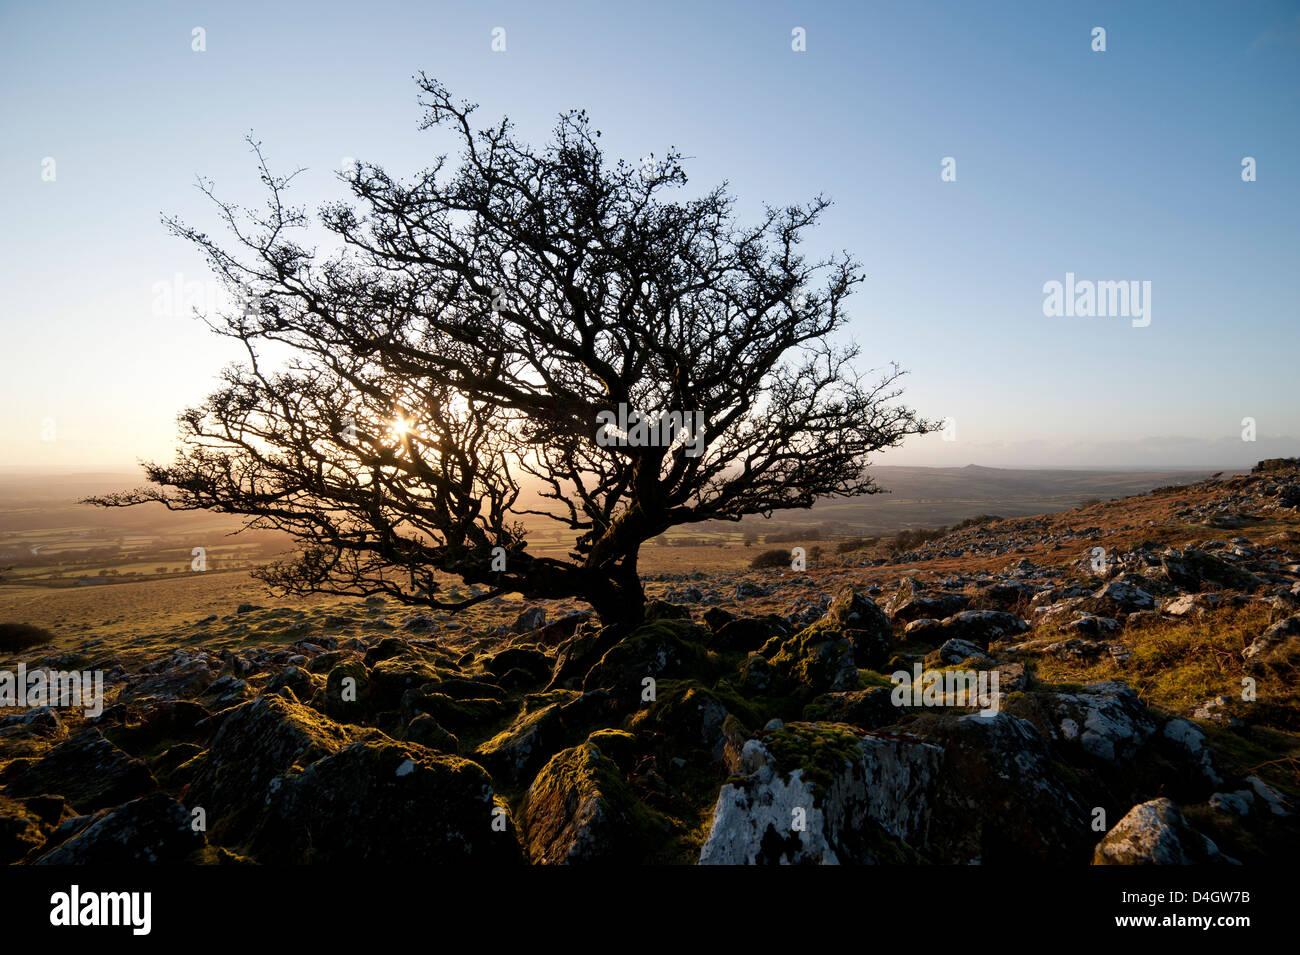 Stunted tree on Dartmoor, Devon, England, UK - Stock Image